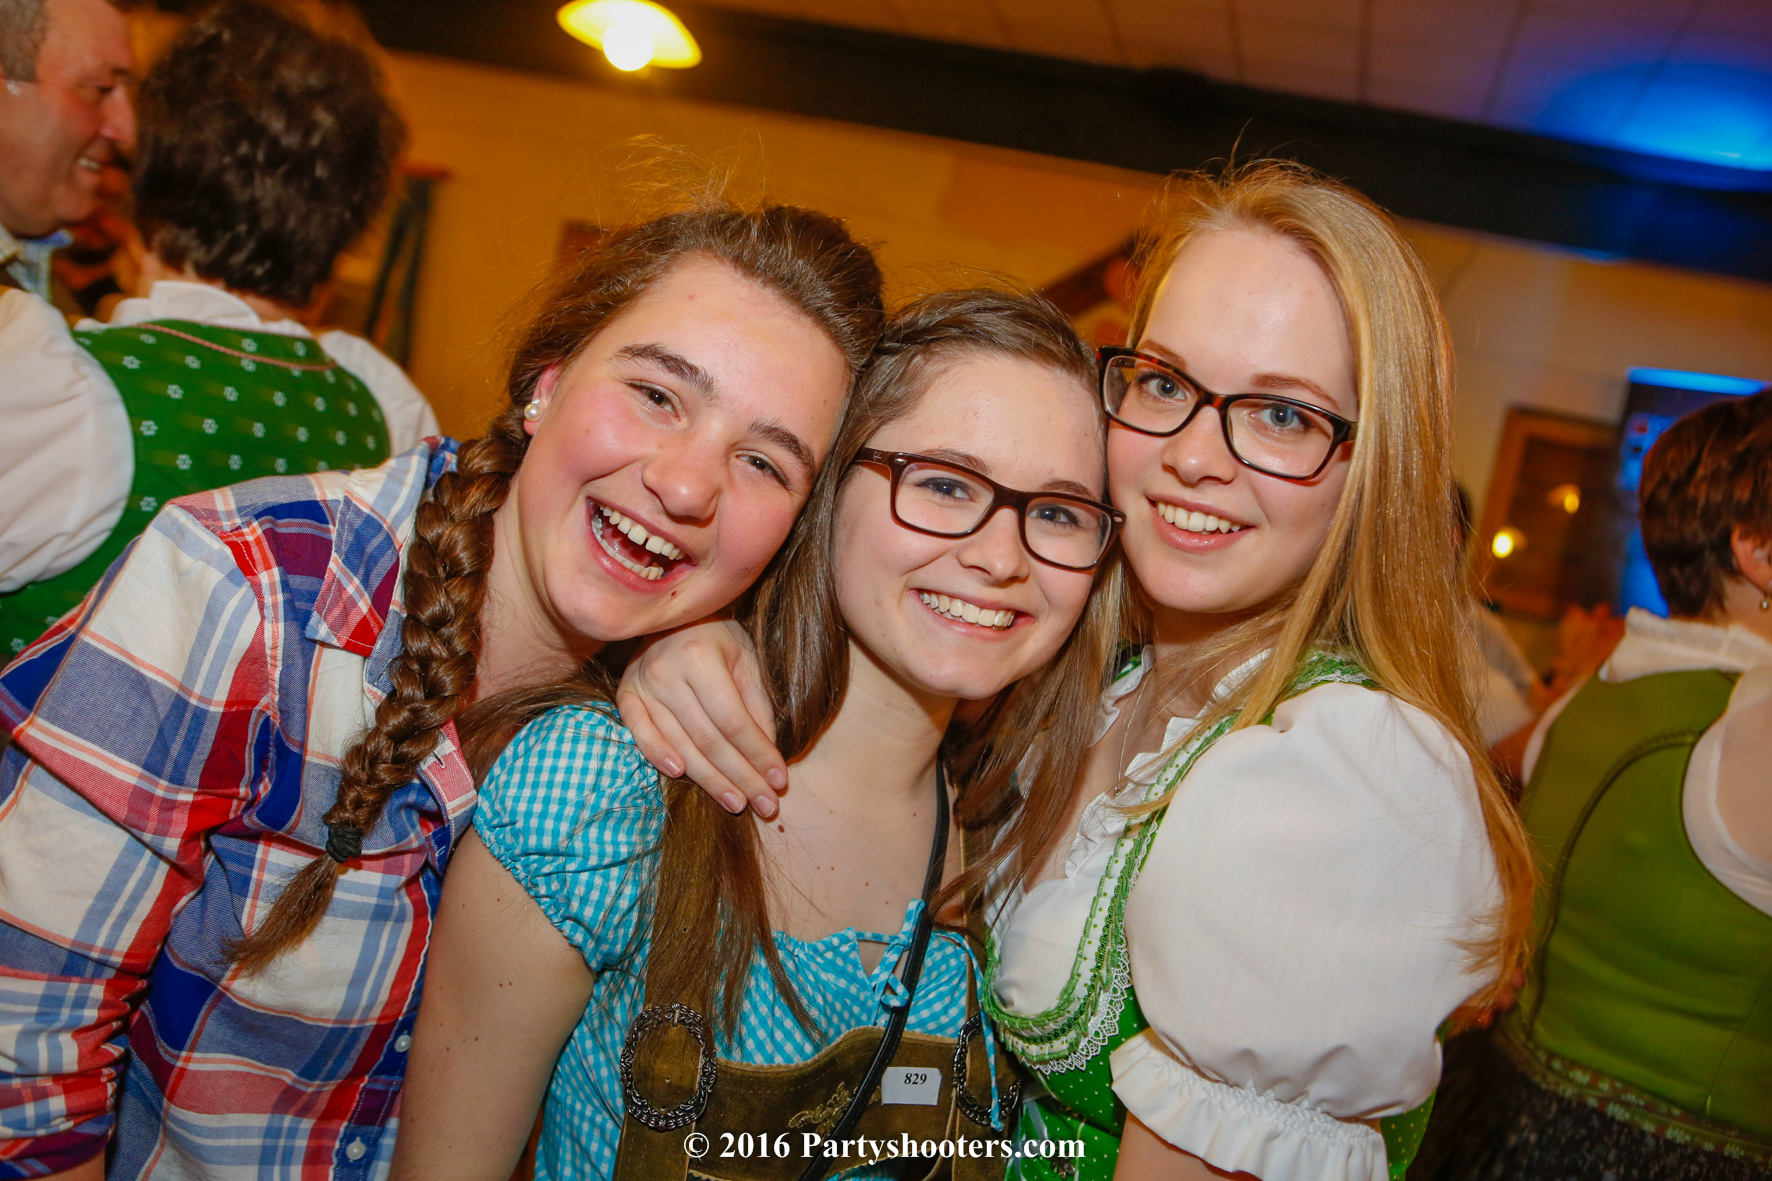 0103 - 4053 - Fruehlingsball Aspach